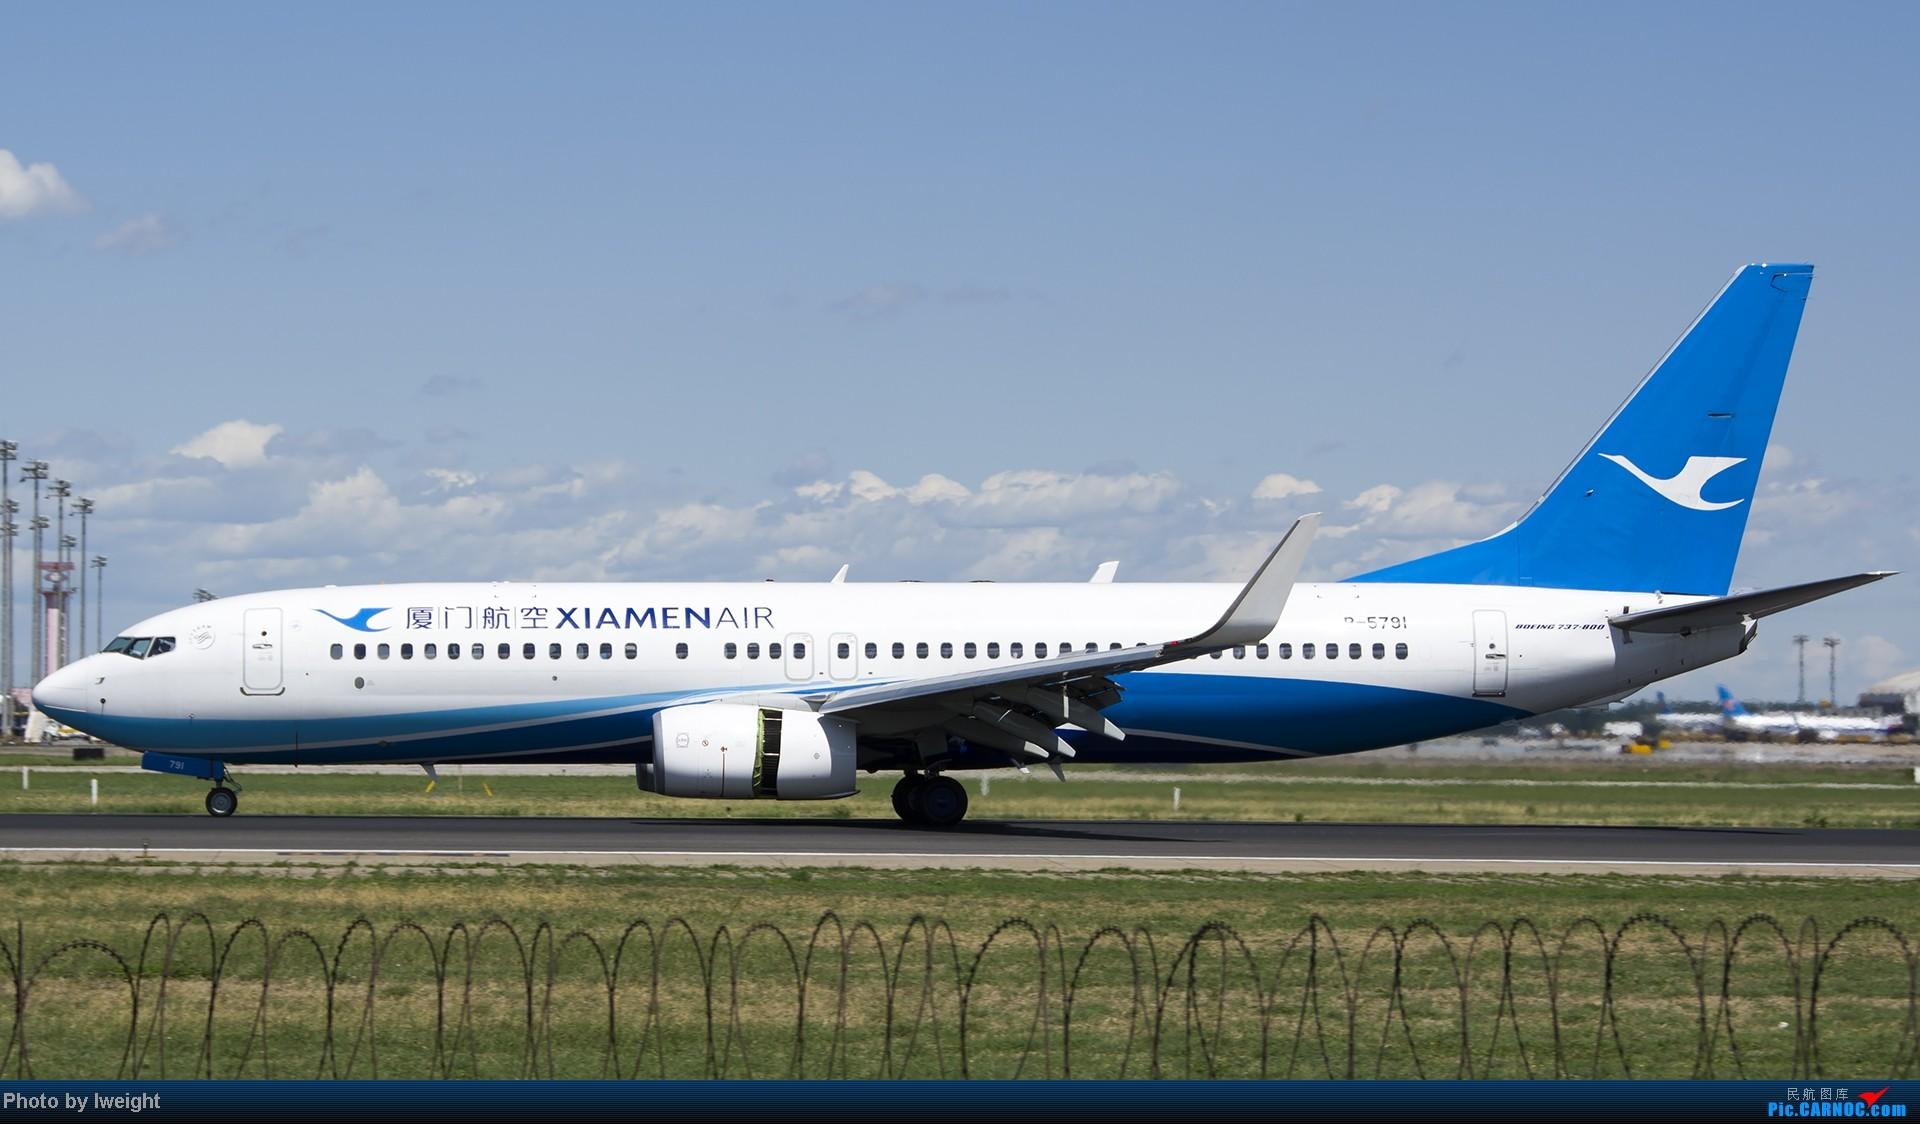 Re:[原创]新相机+好天气,PEK试机乱拍 BOEING 737-800 B-5791 中国北京首都机场